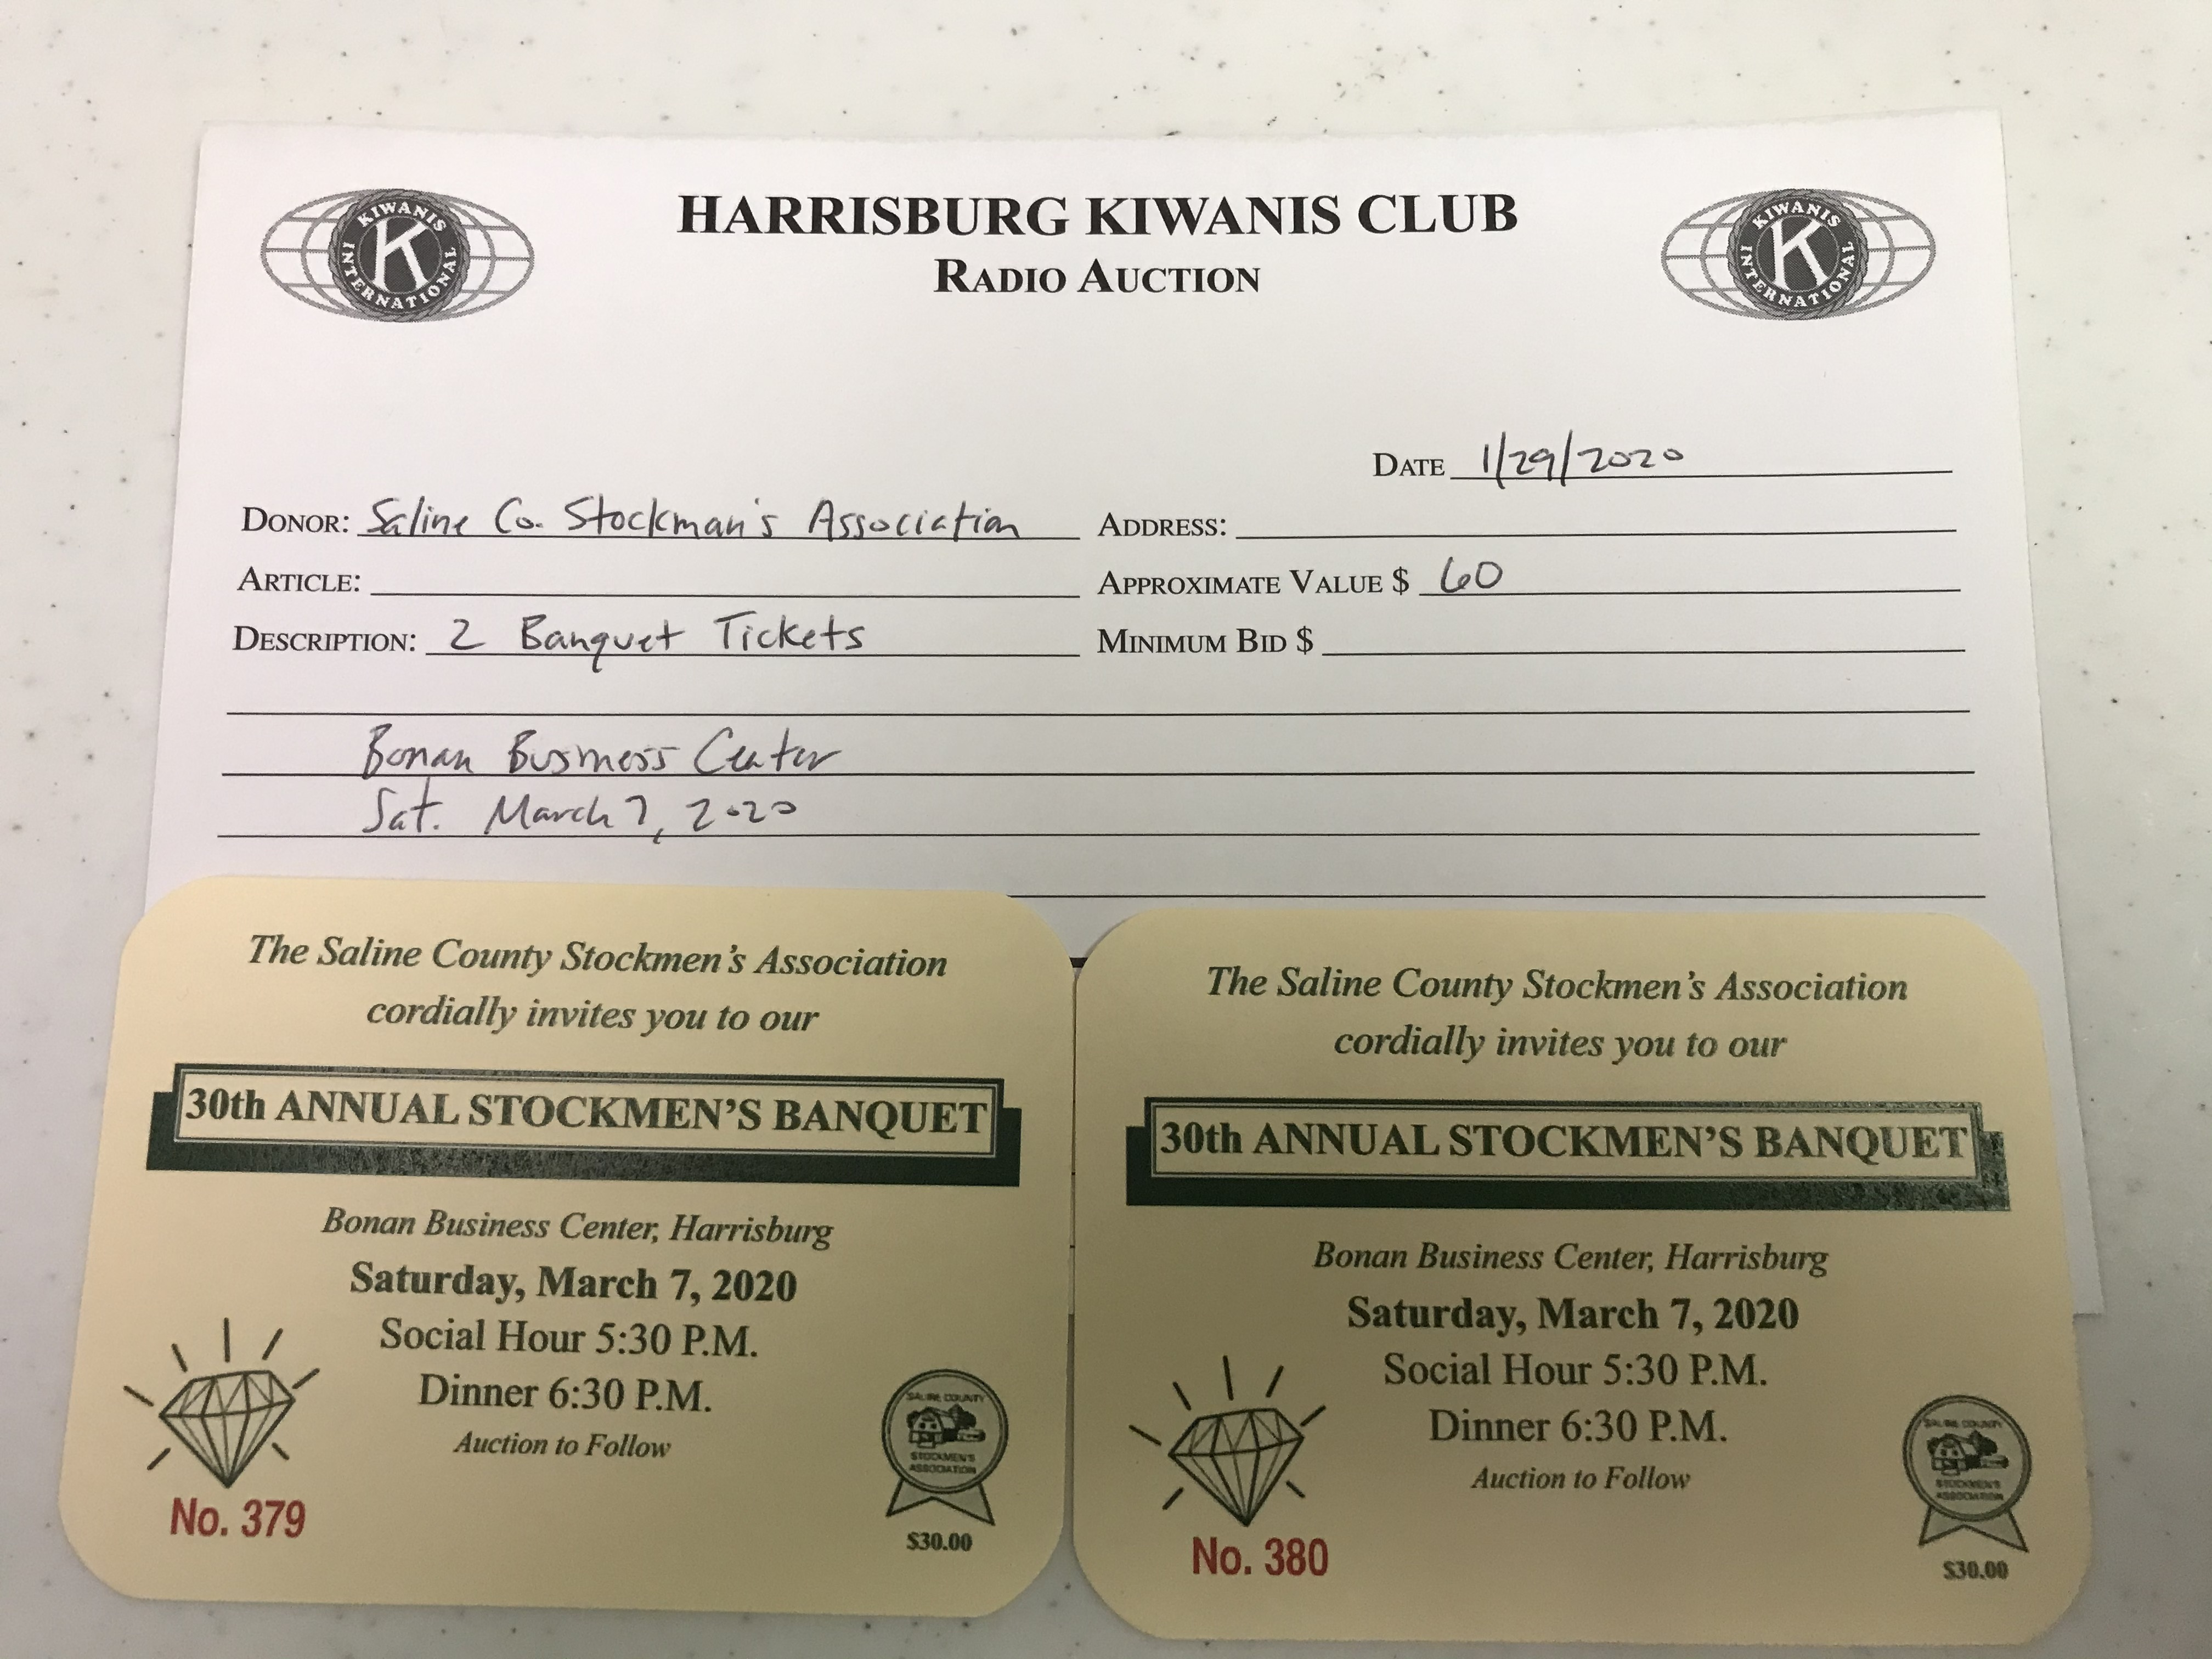 Item 432 - Saline Co. Stockmen's Association 2 Banquet Tickets - March 7, 2020